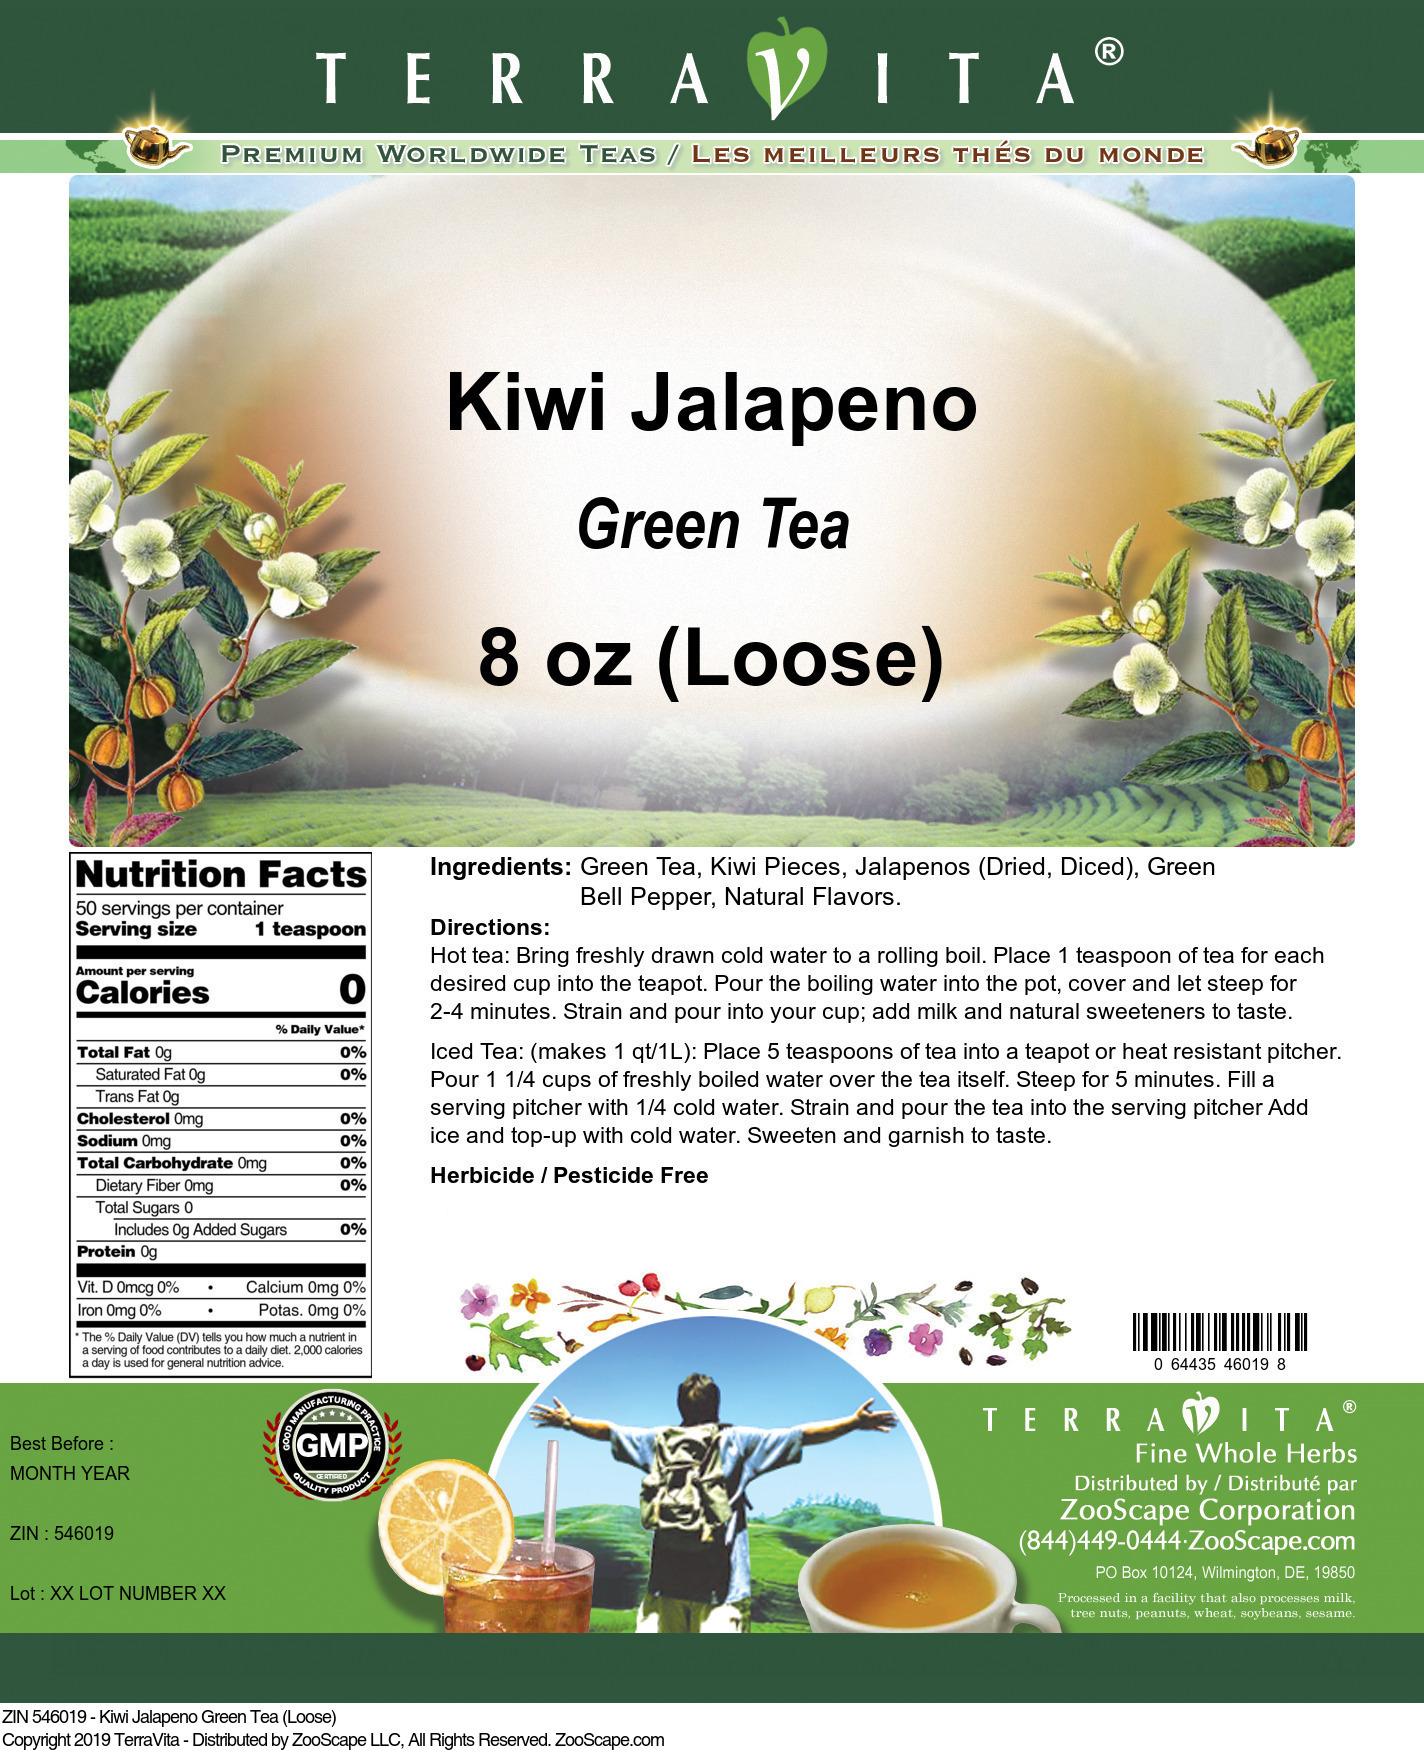 Kiwi Jalapeno Green Tea (Loose)